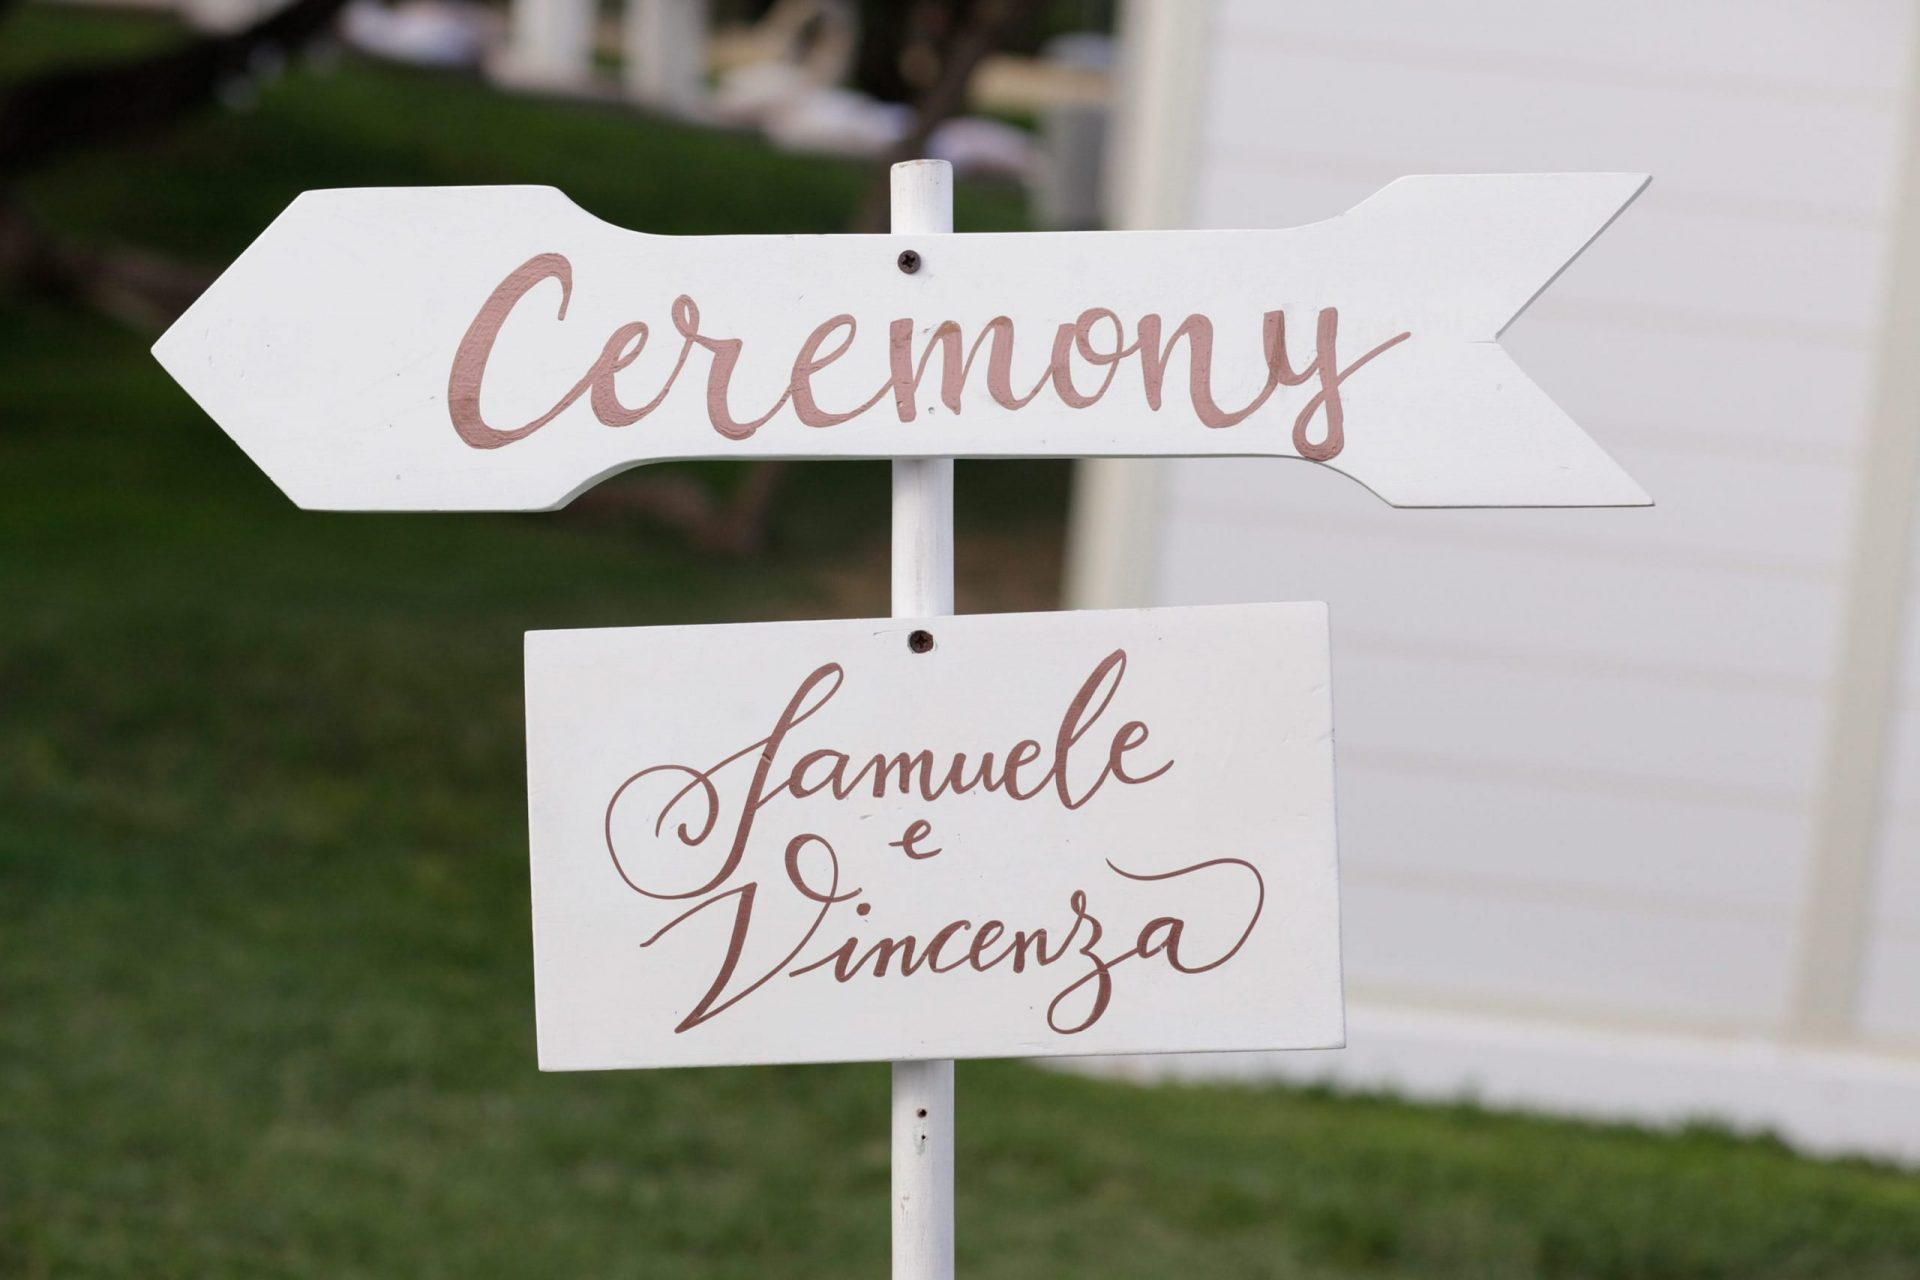 Enza e Samuele, wedding sign